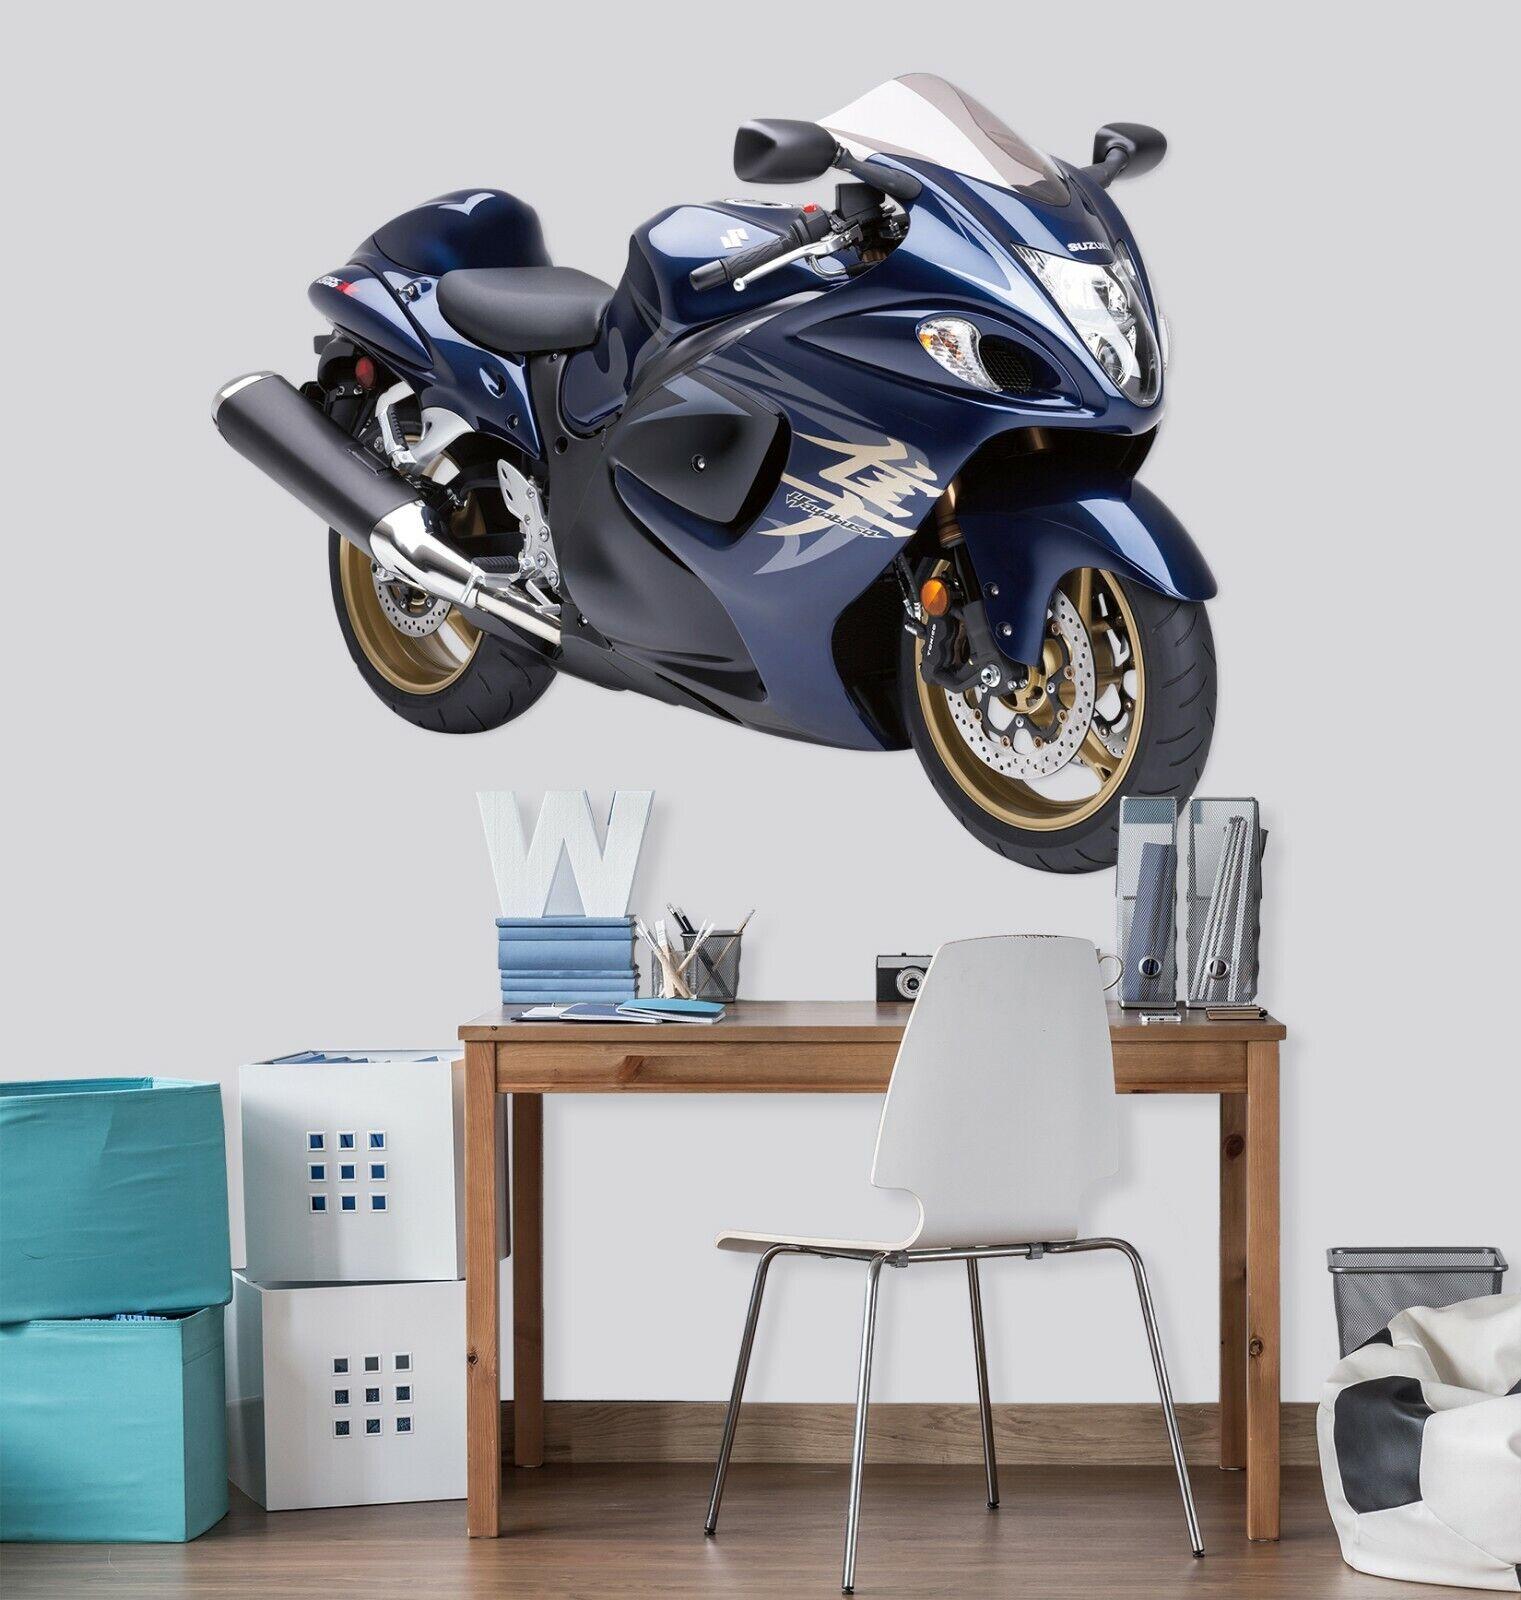 3D Suzuki Motorcycle B177 Car Wallpaper Mural Poster Transport Wall Stickers Wed